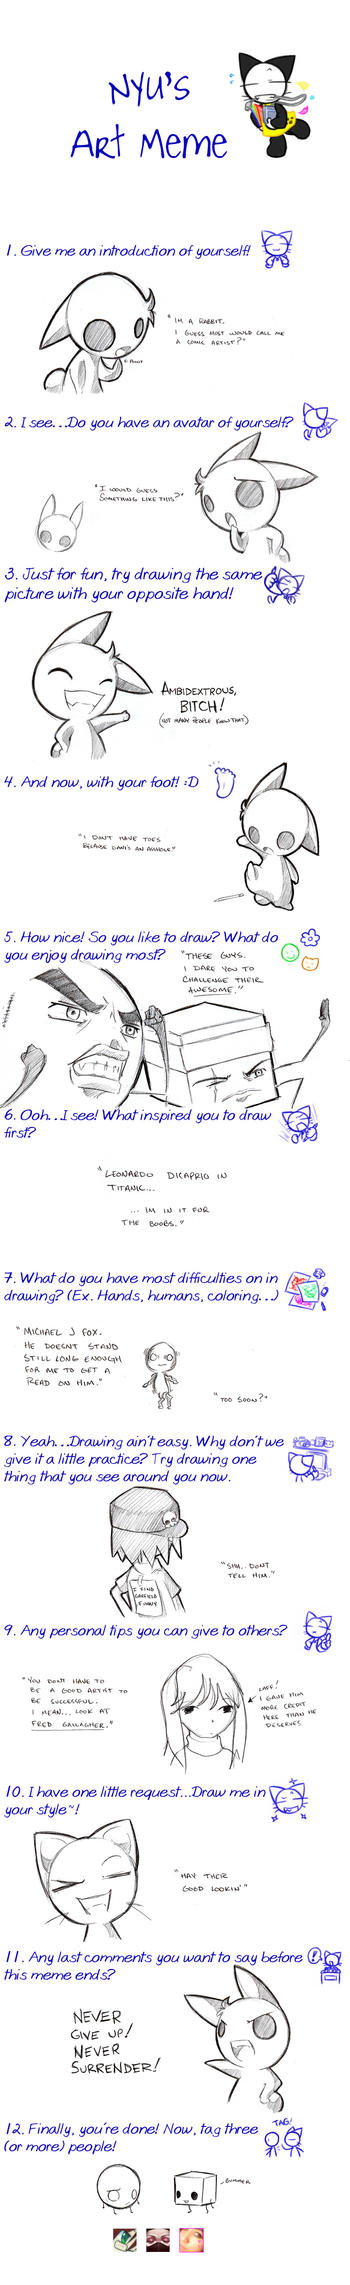 DinoSaurs - Art Meme by justflyakite